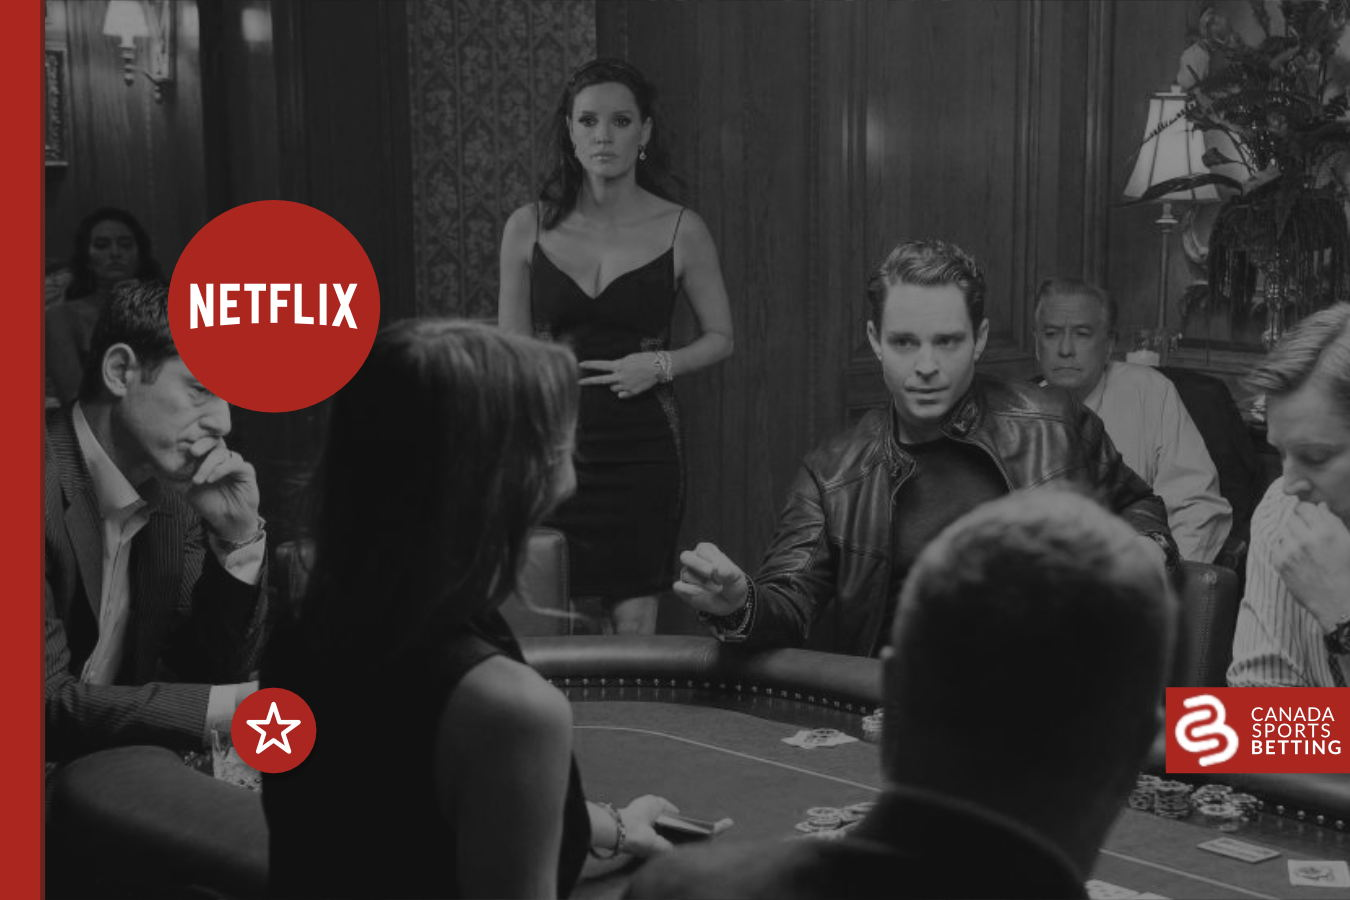 Best Gambling Movies to Watch on Netflix